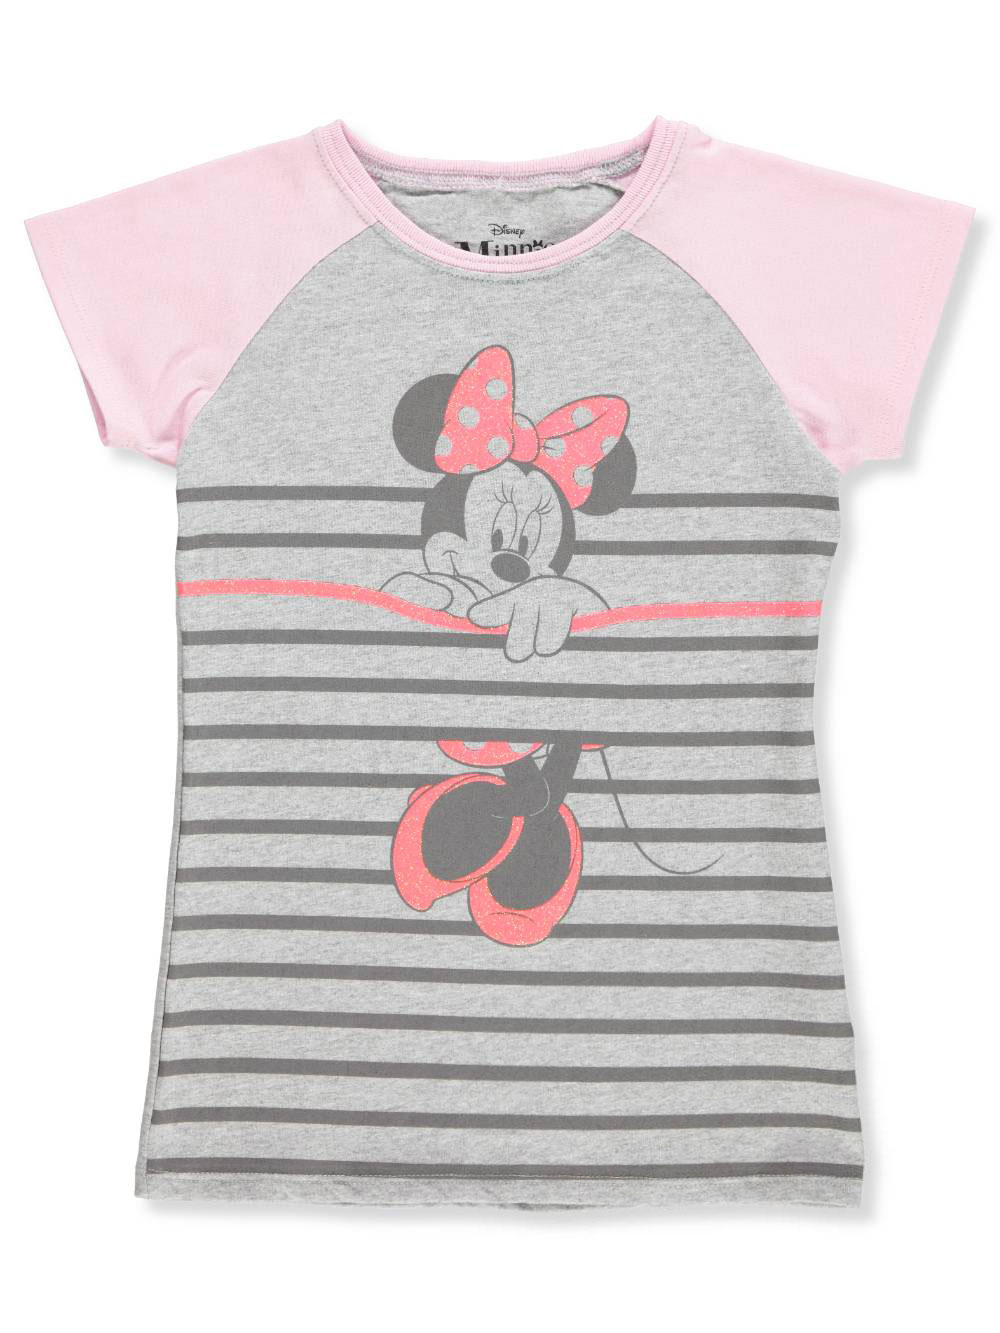 c25cc3bcf4c Disney Minnie Mouse Girls  T-Shirt